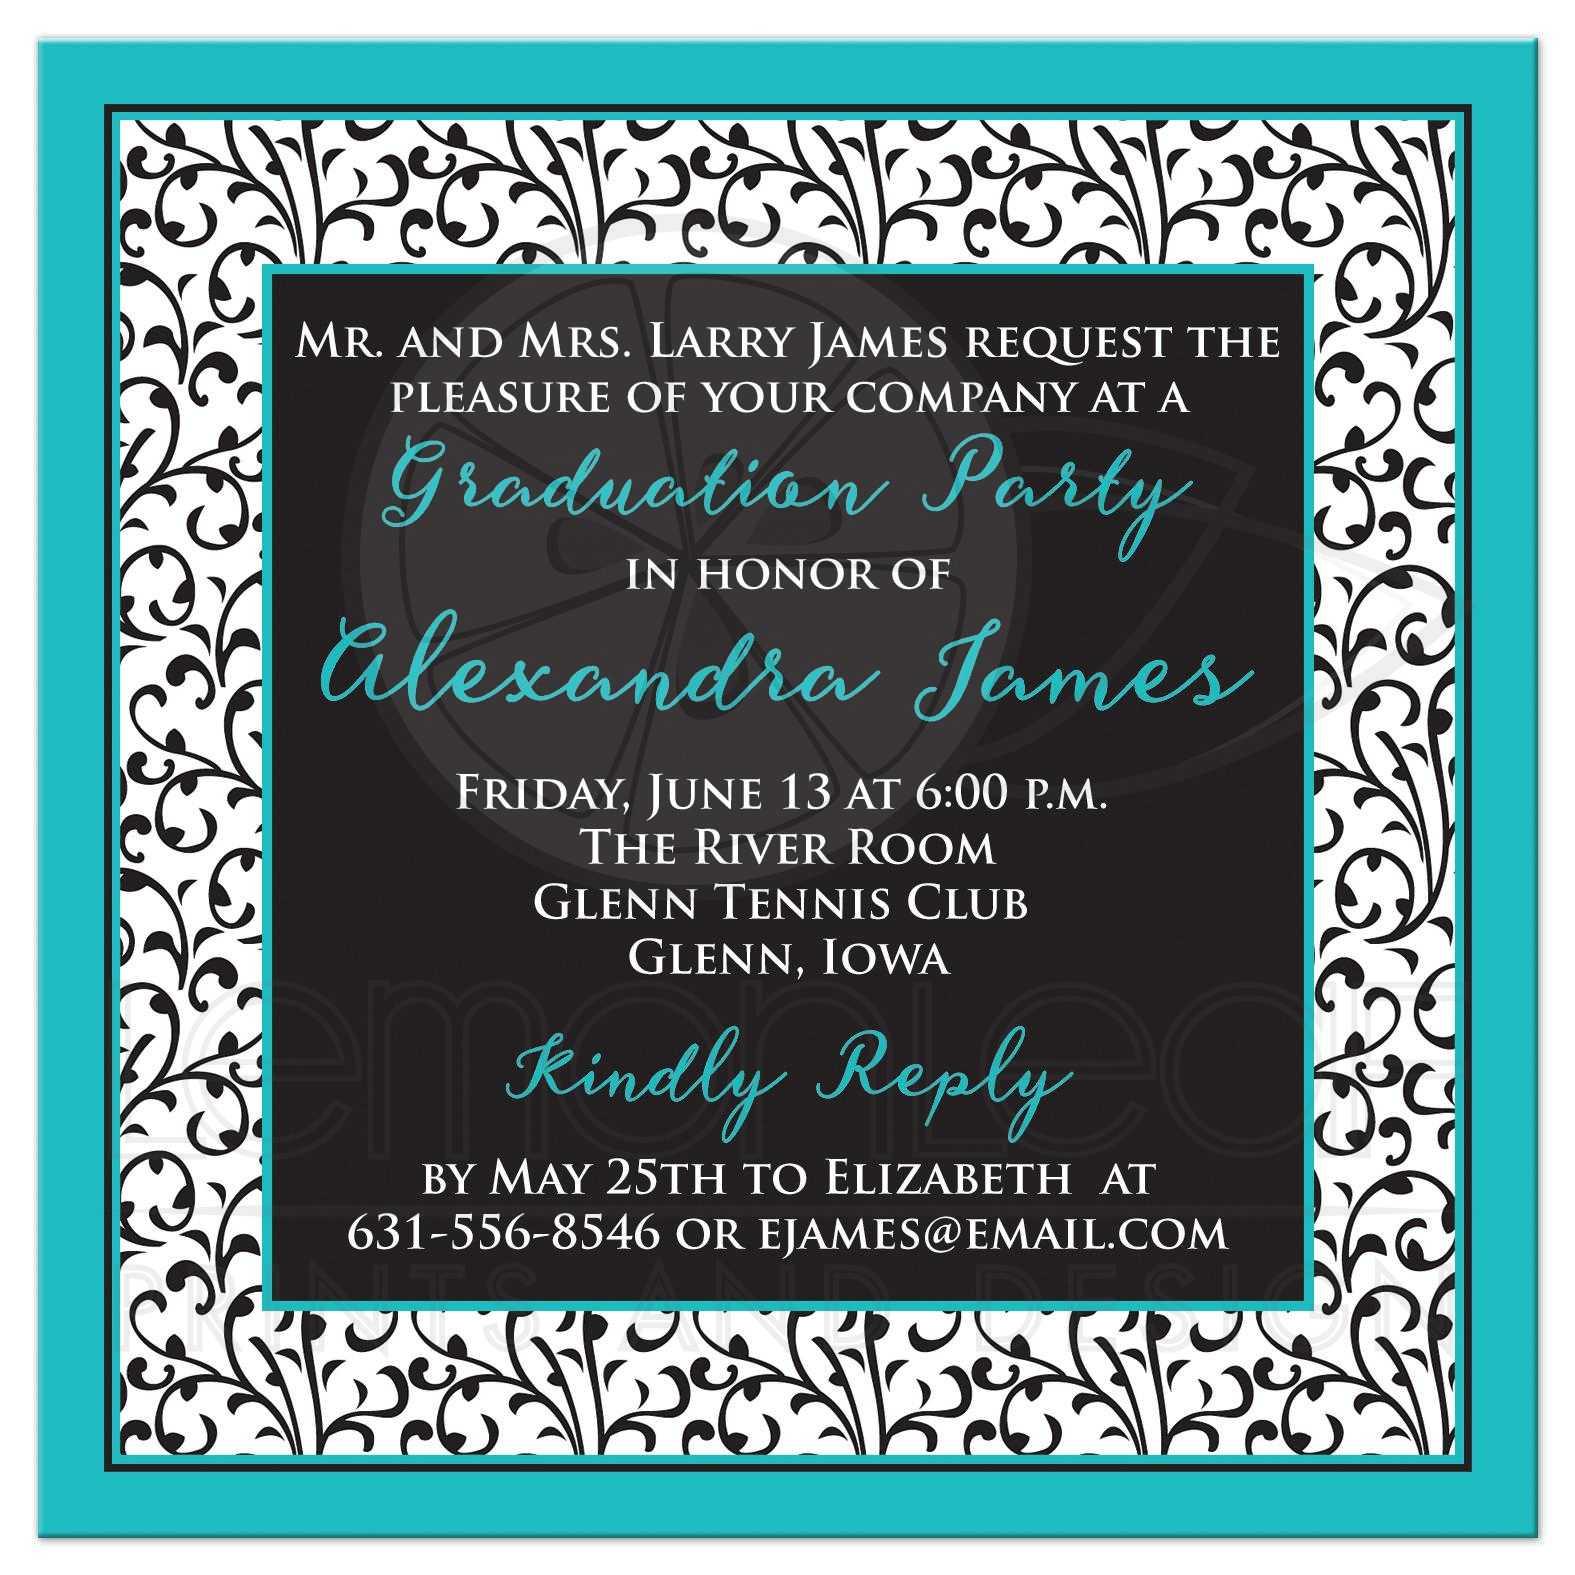 Photo graduation invitation chic turquoise black white and trendy turquoise black and white floral damask pattern photo graduation invitation filmwisefo Choice Image